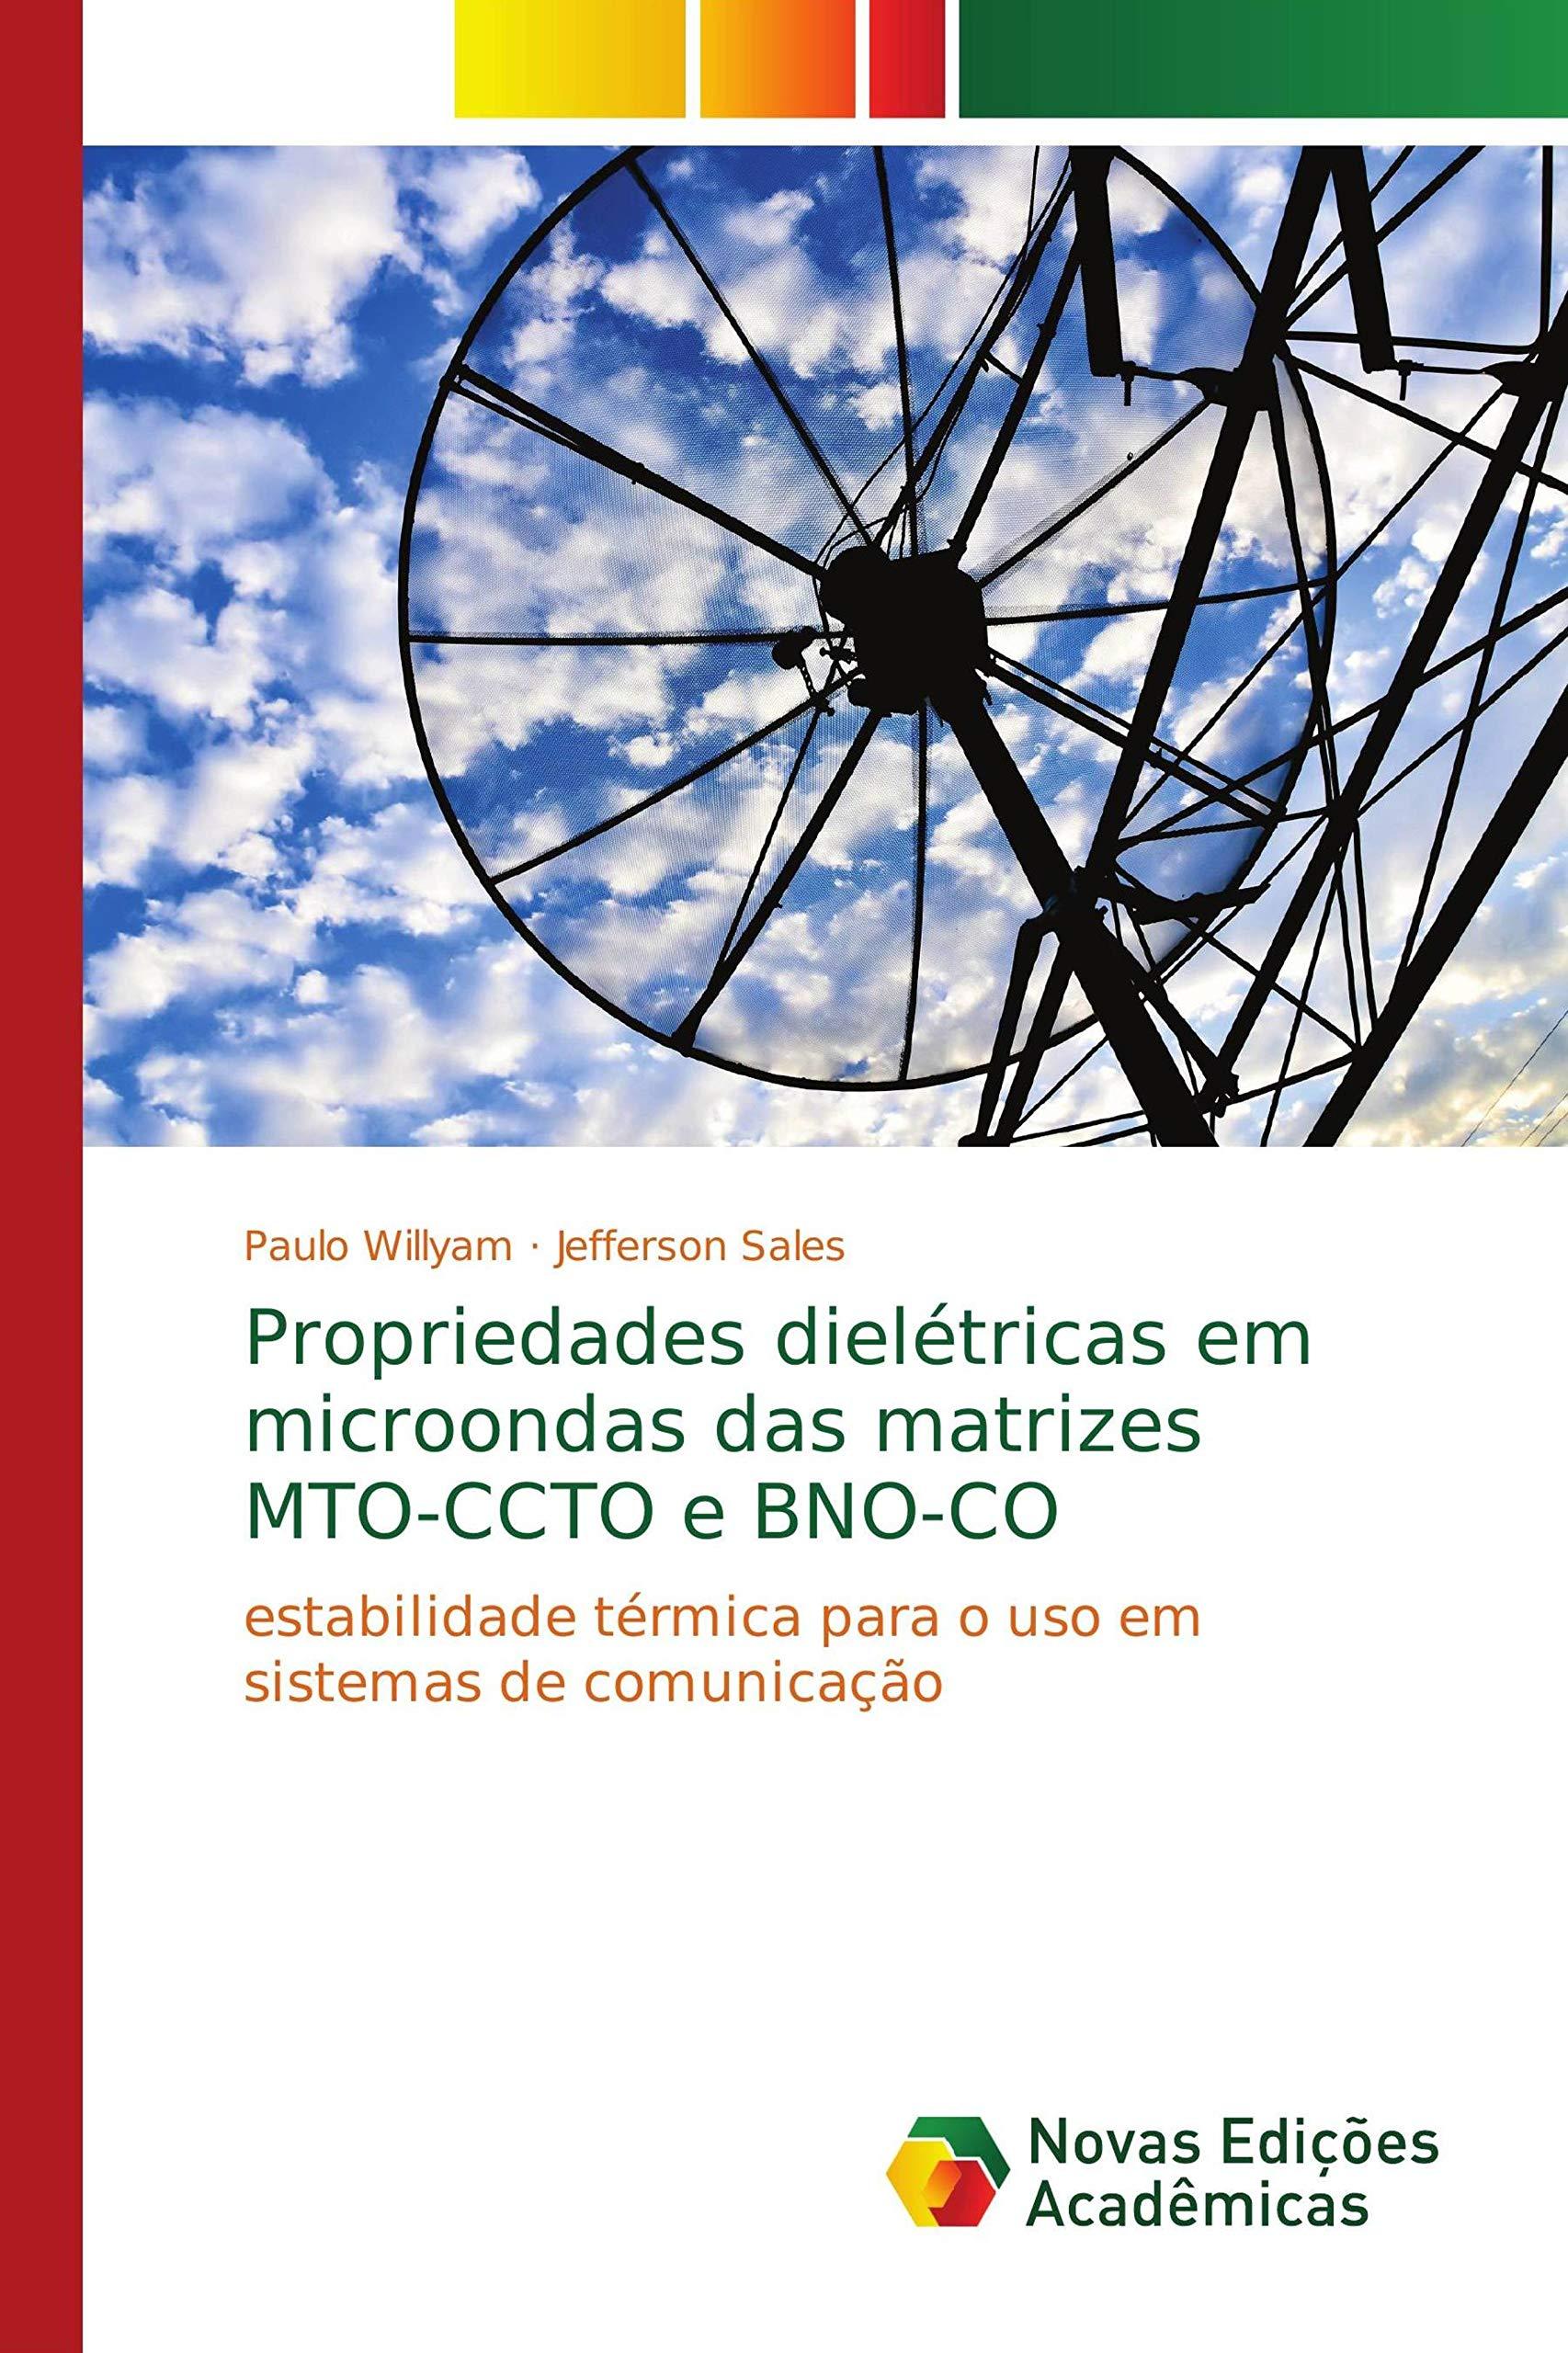 Propriedades dielétricas em microondas das matrizes MTO-CCTO ...